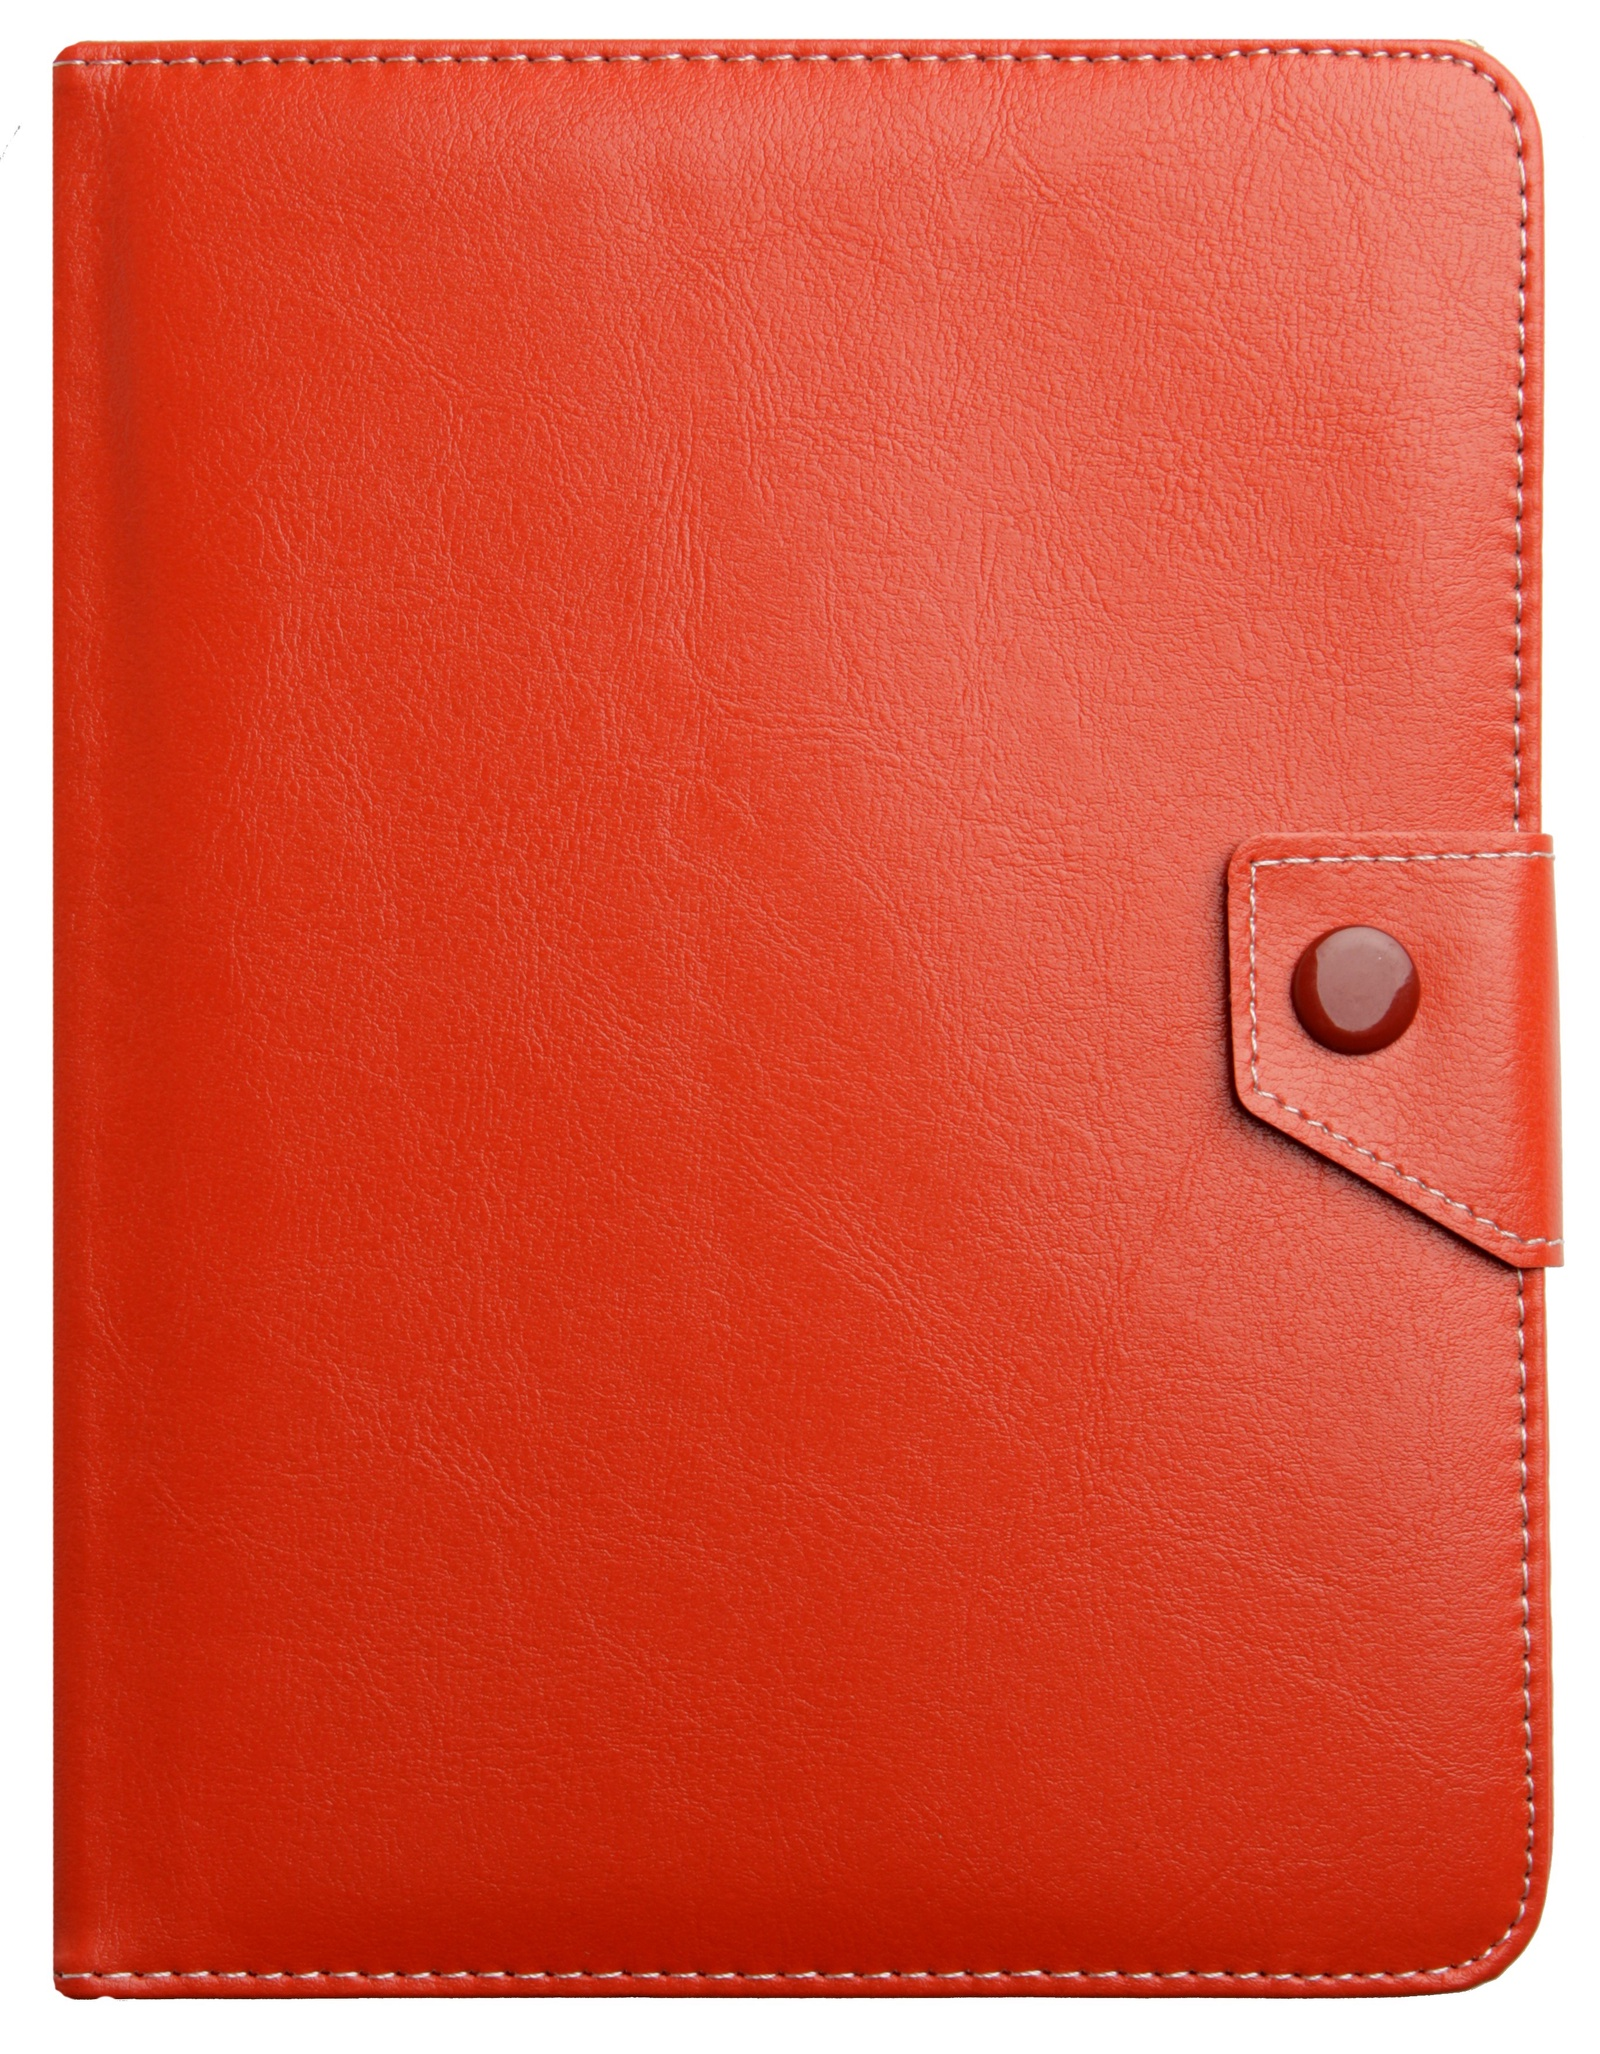 Чехол для планшета ProShield Standard clips8, 4630042529670, красный чехол универсальный proshield standard clips8 2000000139876 золотистый